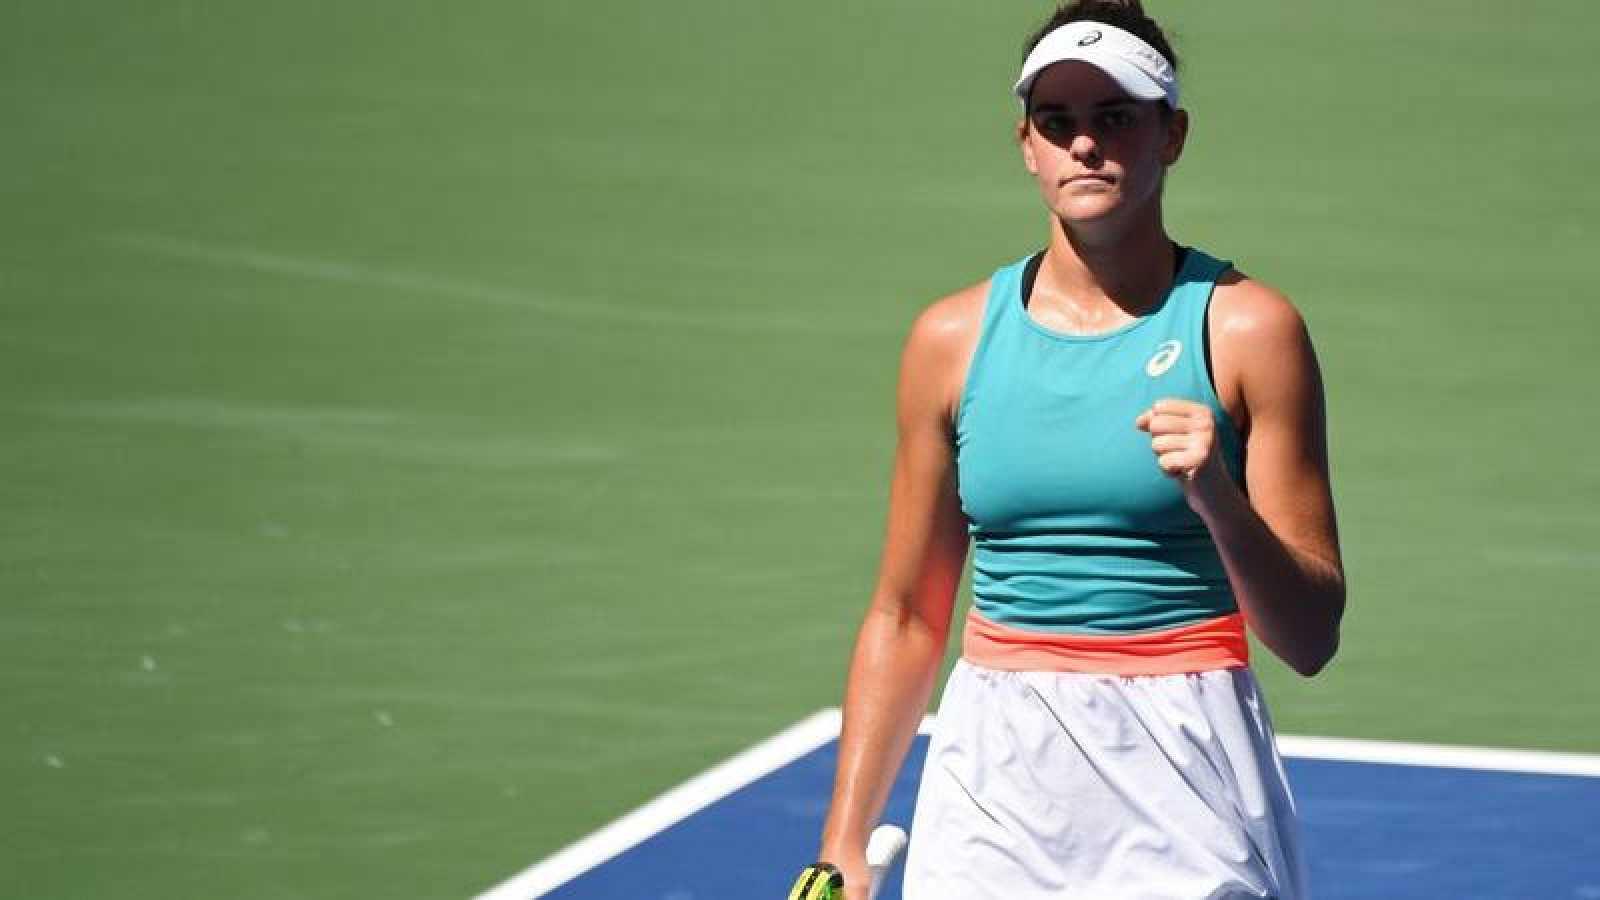 La tenista estadounidense Jennifer Brady celebra su victoria ante Putintseva en el US Open.